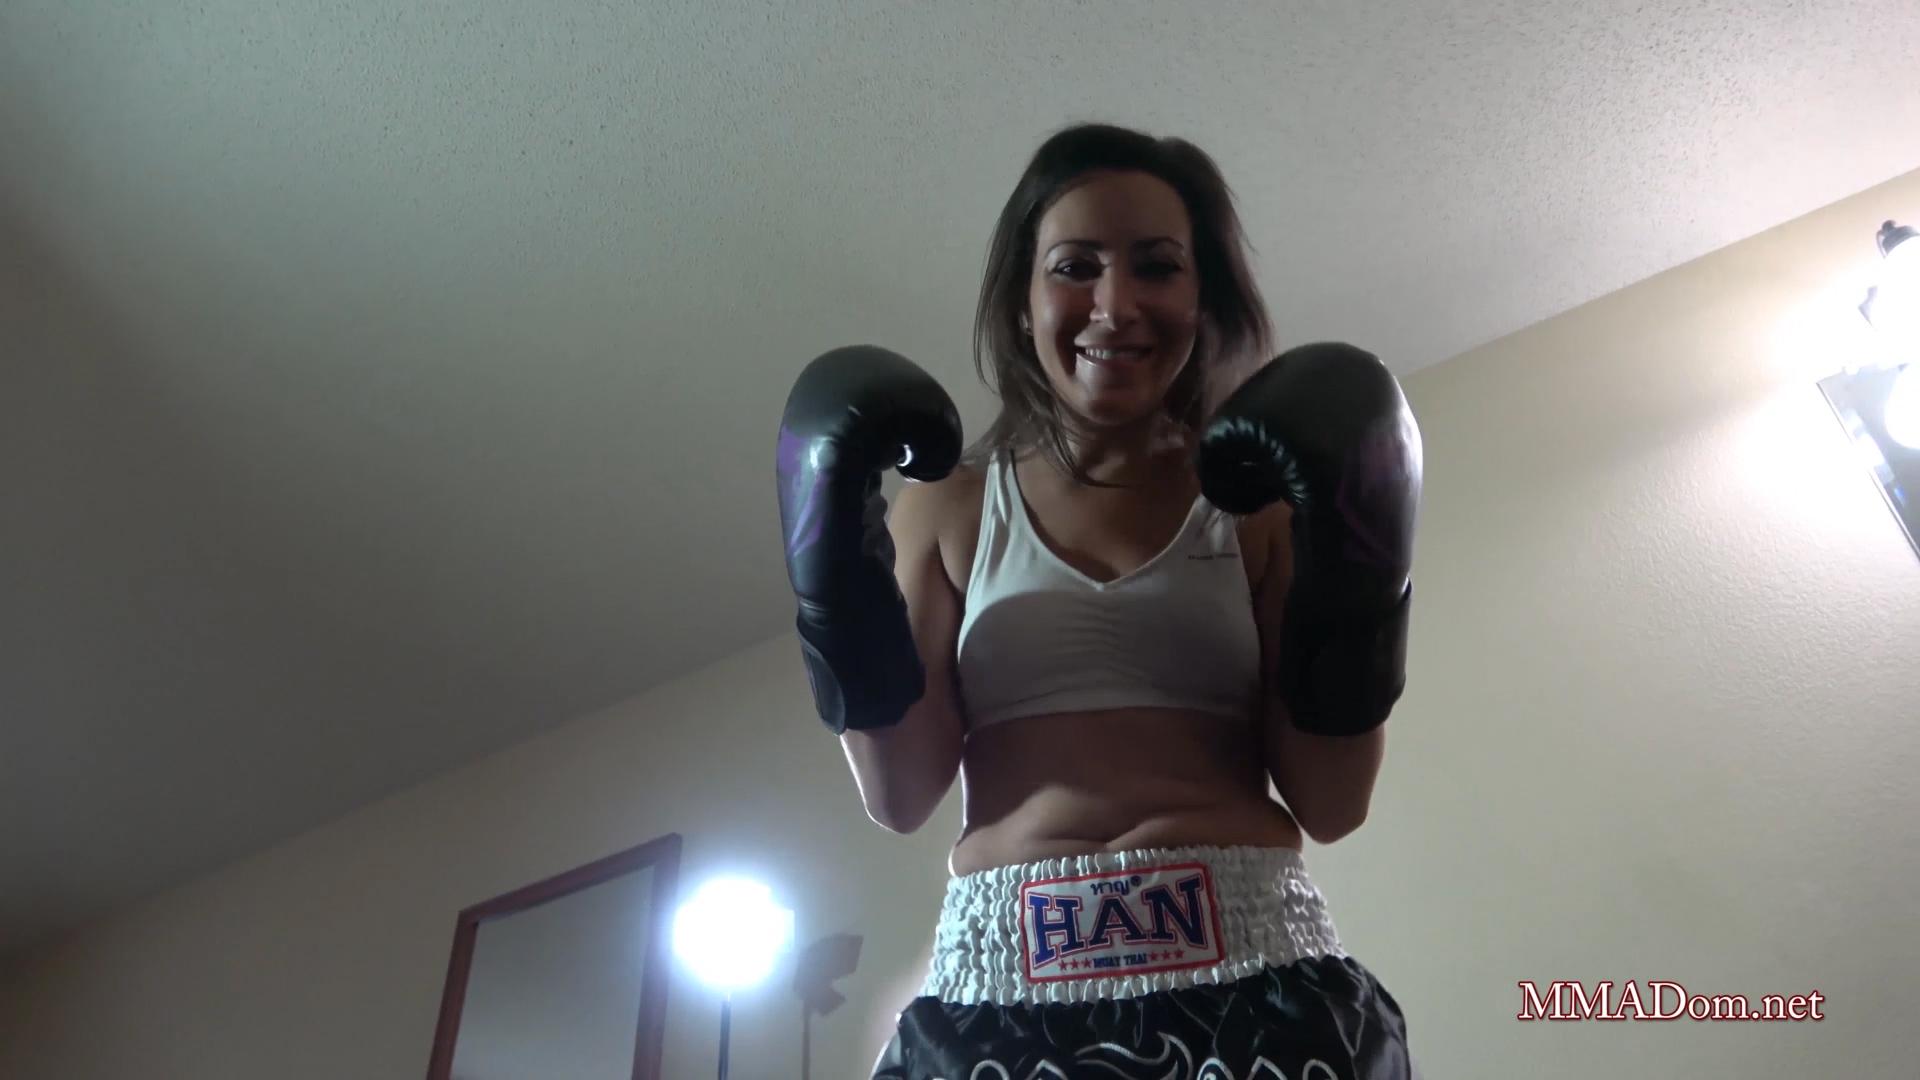 pandora_pov_boxing_beatdown.Still004